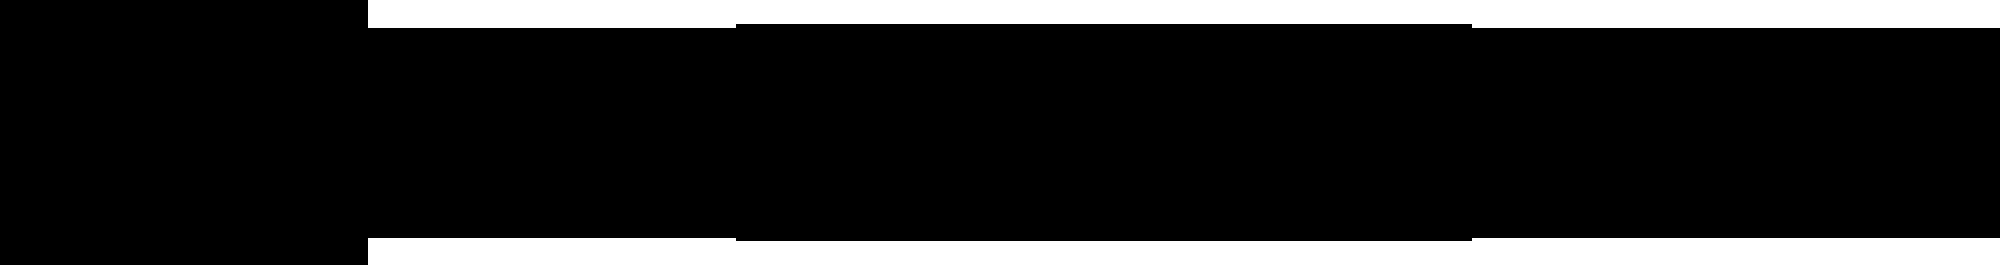 maschine logo